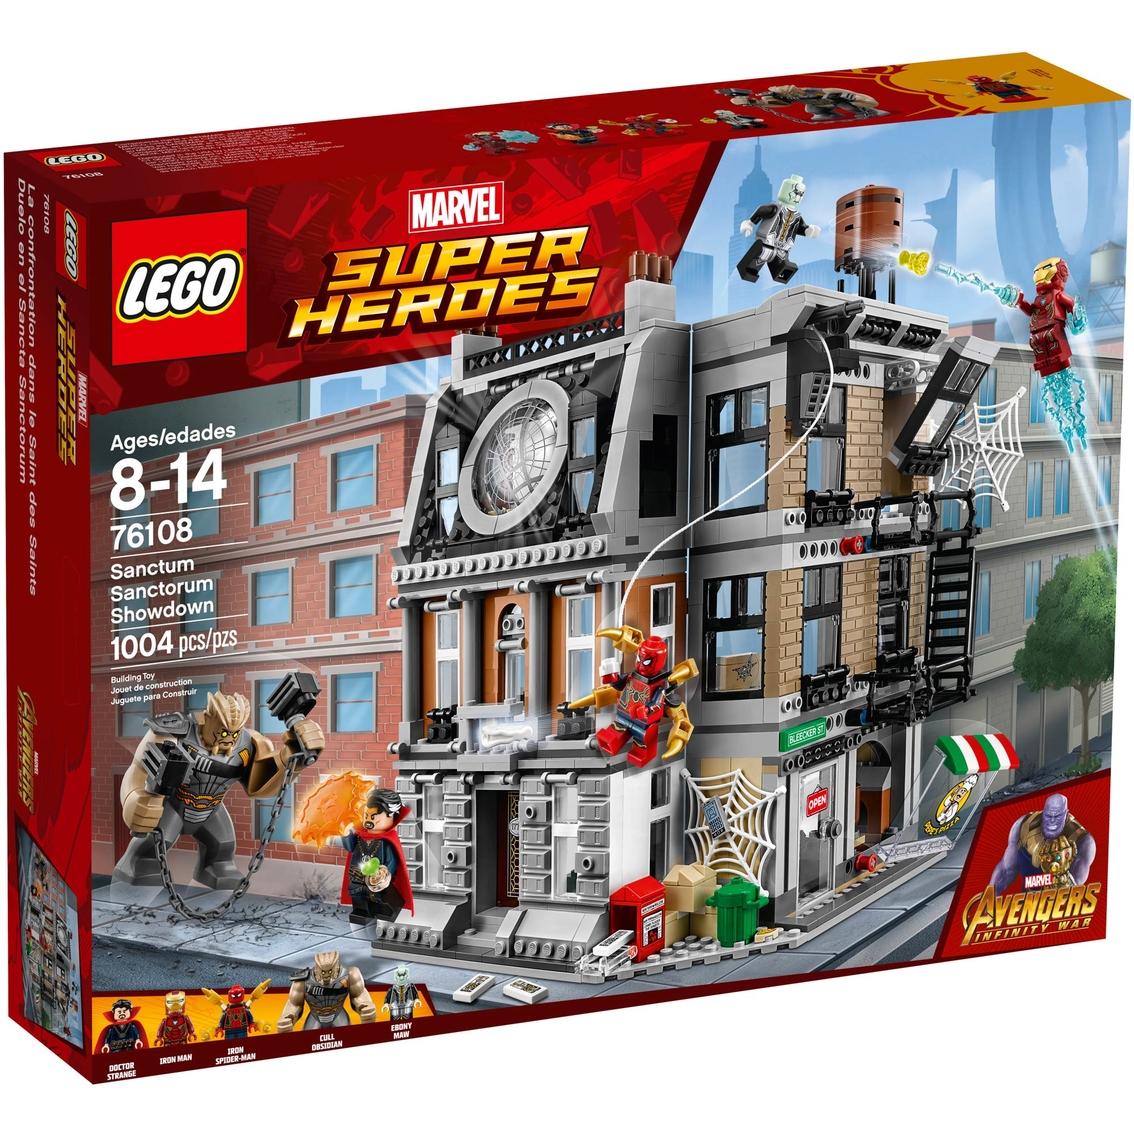 LEGO Marvel Super Heroes Sanctum Sanctorum Showdown 1004 Piece Set for Kids 8-14